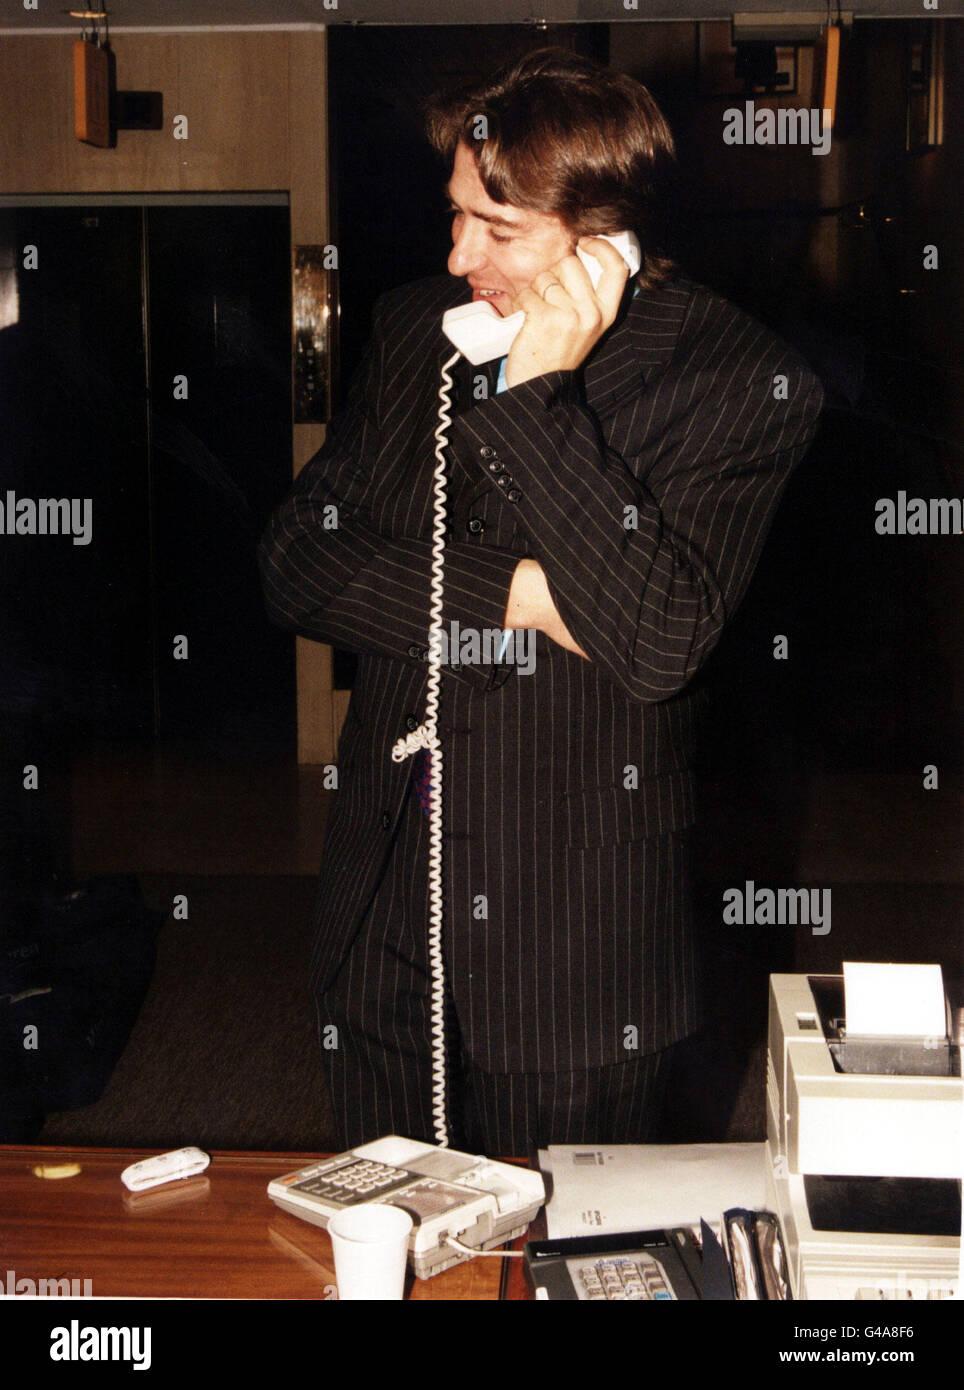 Pa News Photo 3 10 97 Tv Presenter Jonathan Ross At The Regent Stock Photo Alamy